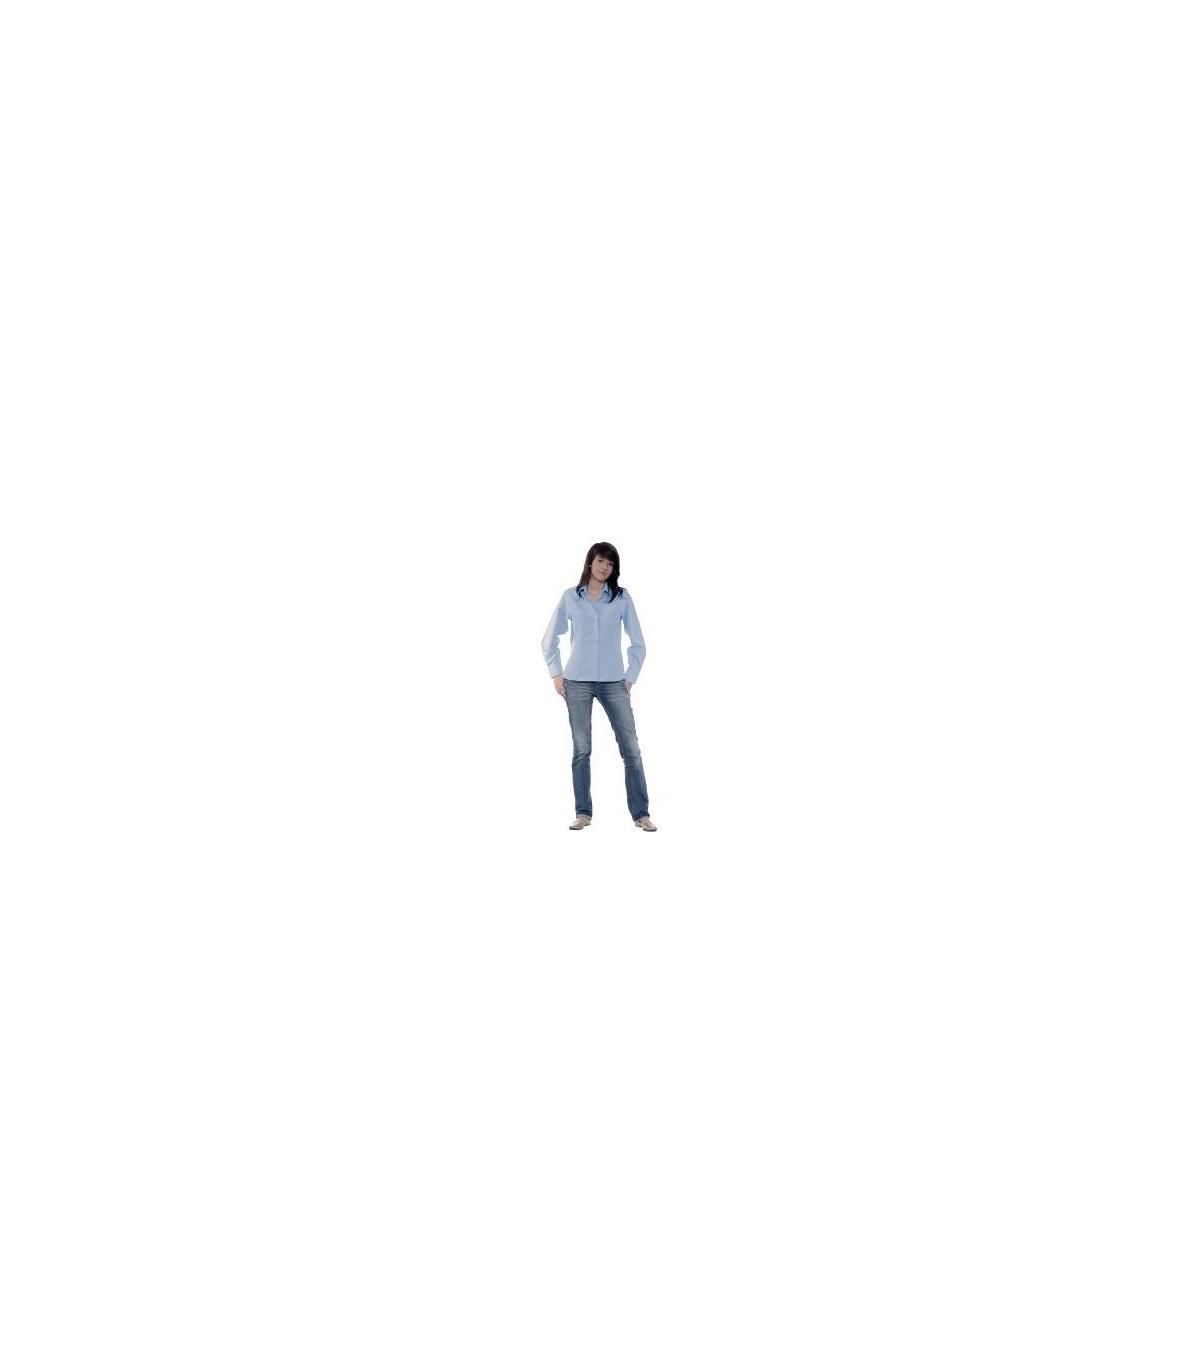 c75ea36d2c ... Valento camisa mujer CEREMONY. SALE. https   www.gruposr.es 530 valento- camisa-